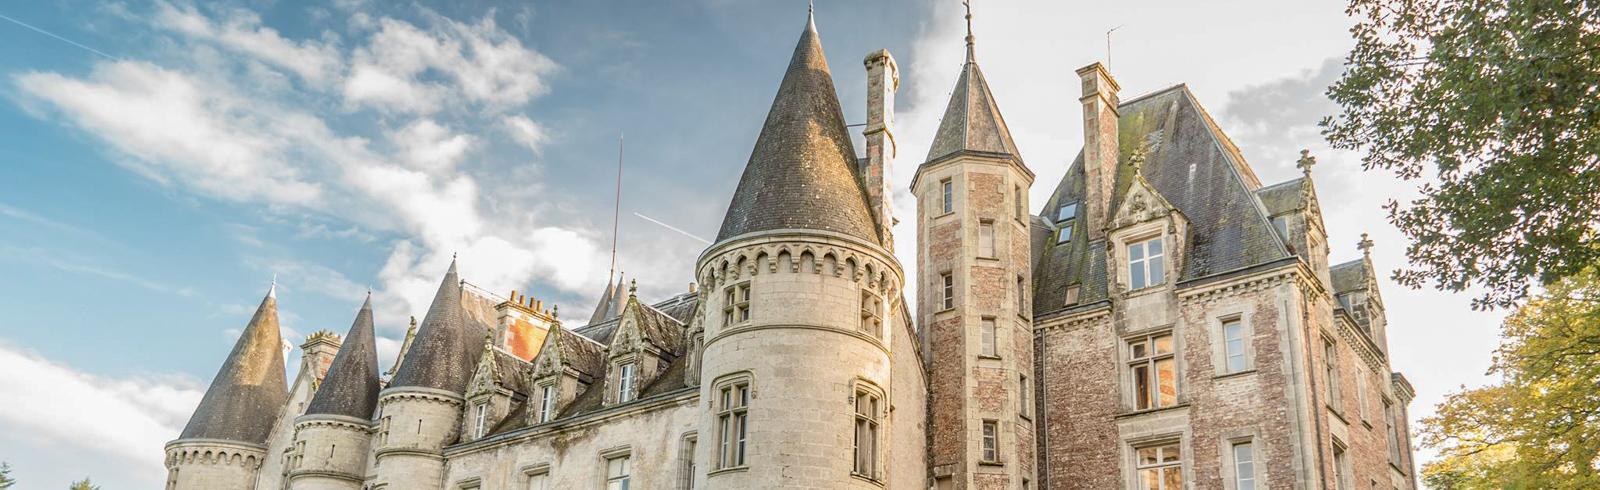 rando chateau de tredion